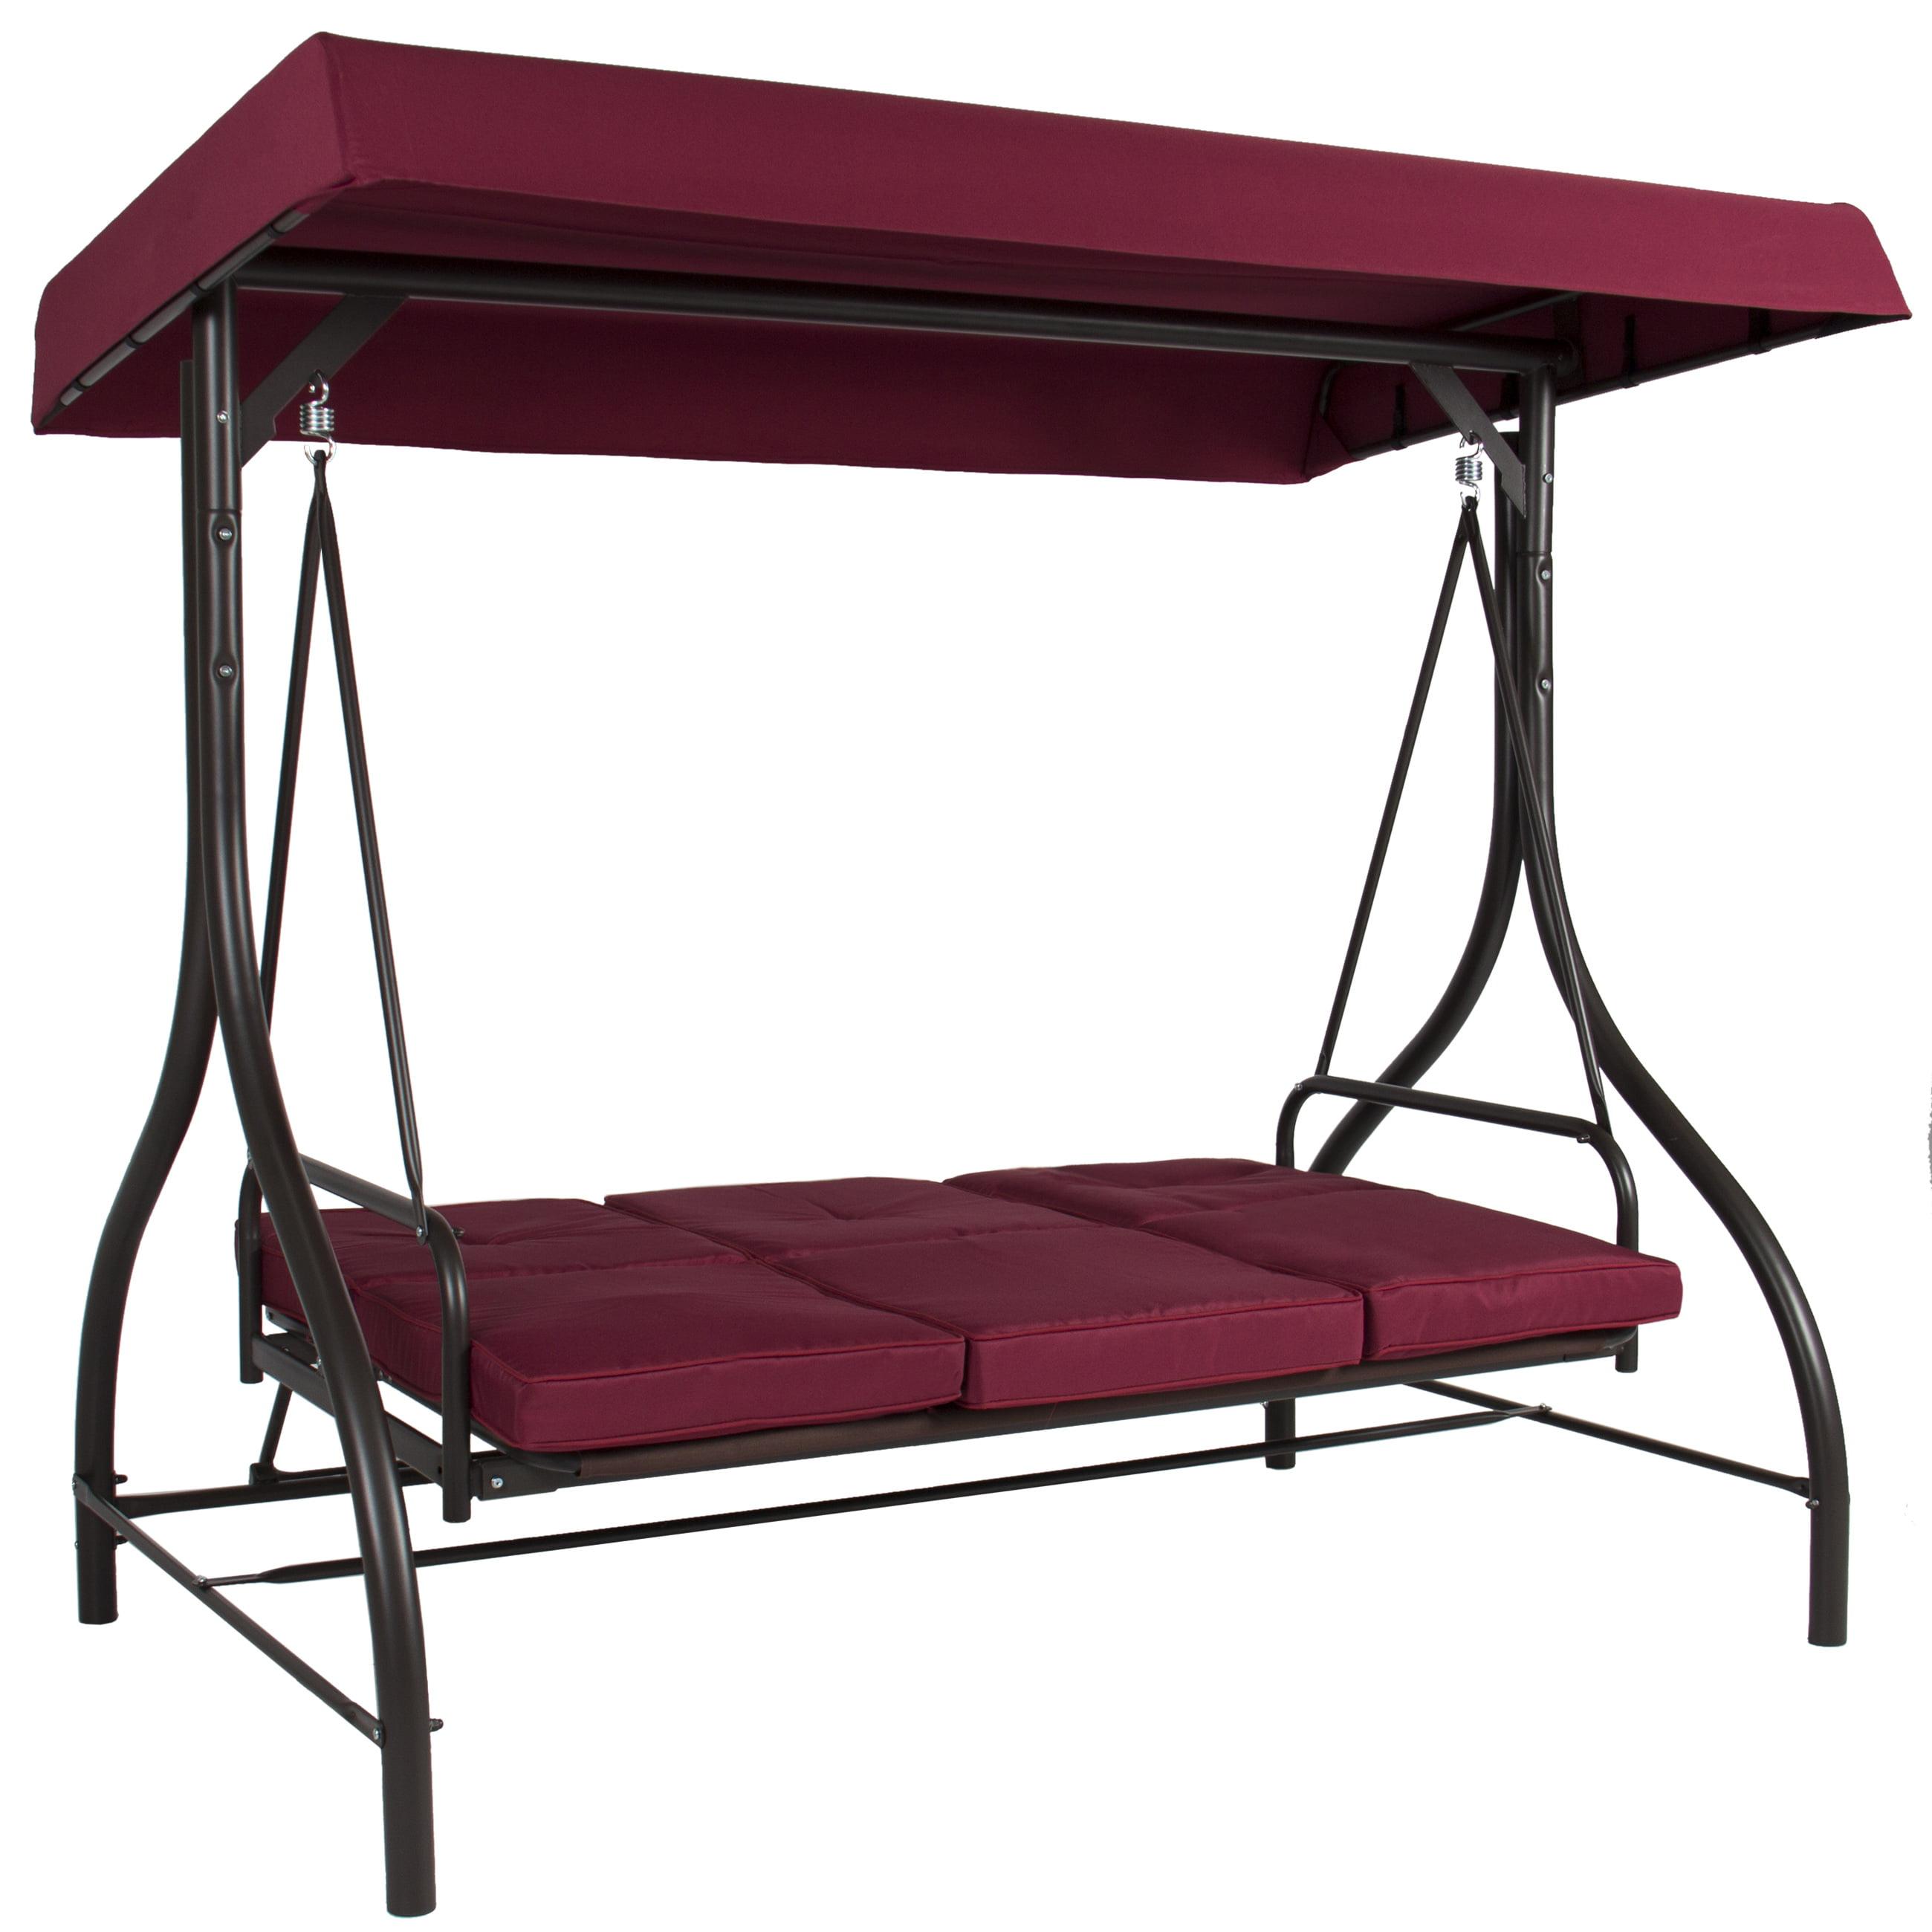 Best Choice Products 3 Seat Converting Outdoor Patio Canopy Swing Hammock Burgundy Walmart Com Walmart Com